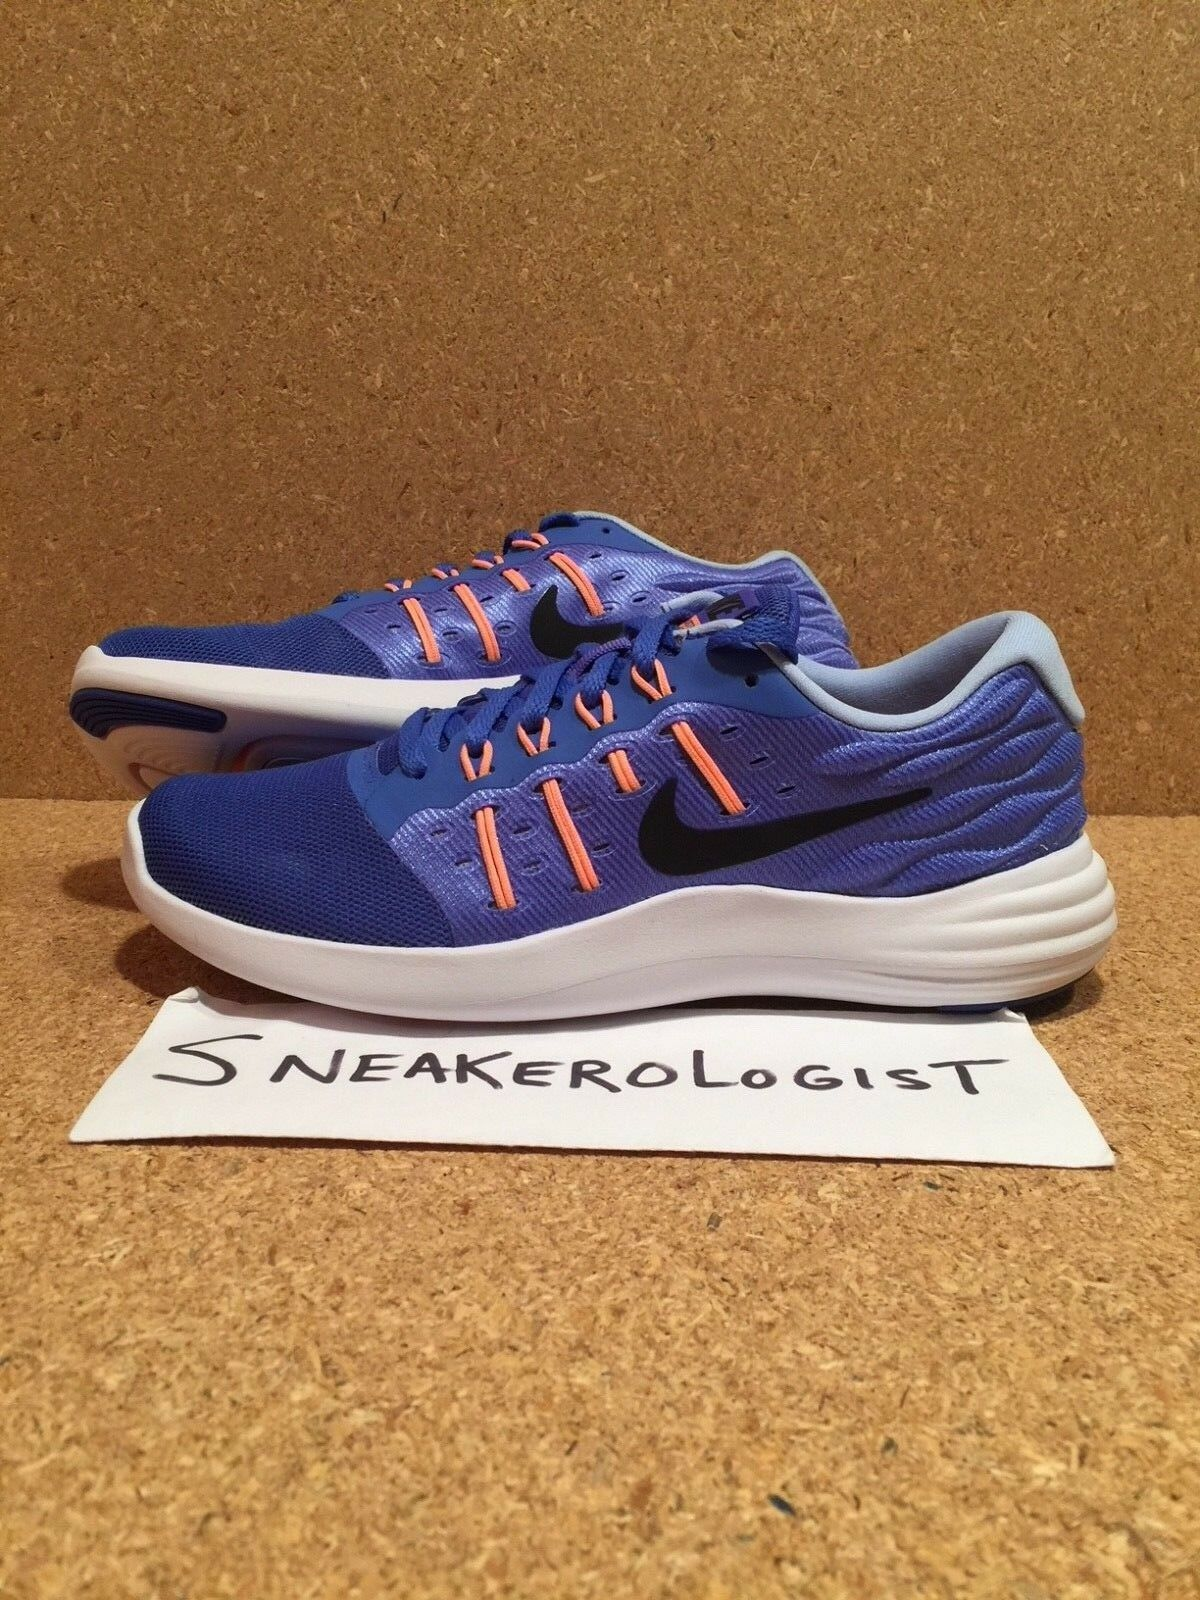 Nike Wmns lunarstelos Medio Negro Azul Negro Medio Sunset Glow para mujer 844736-402 3c4e7b